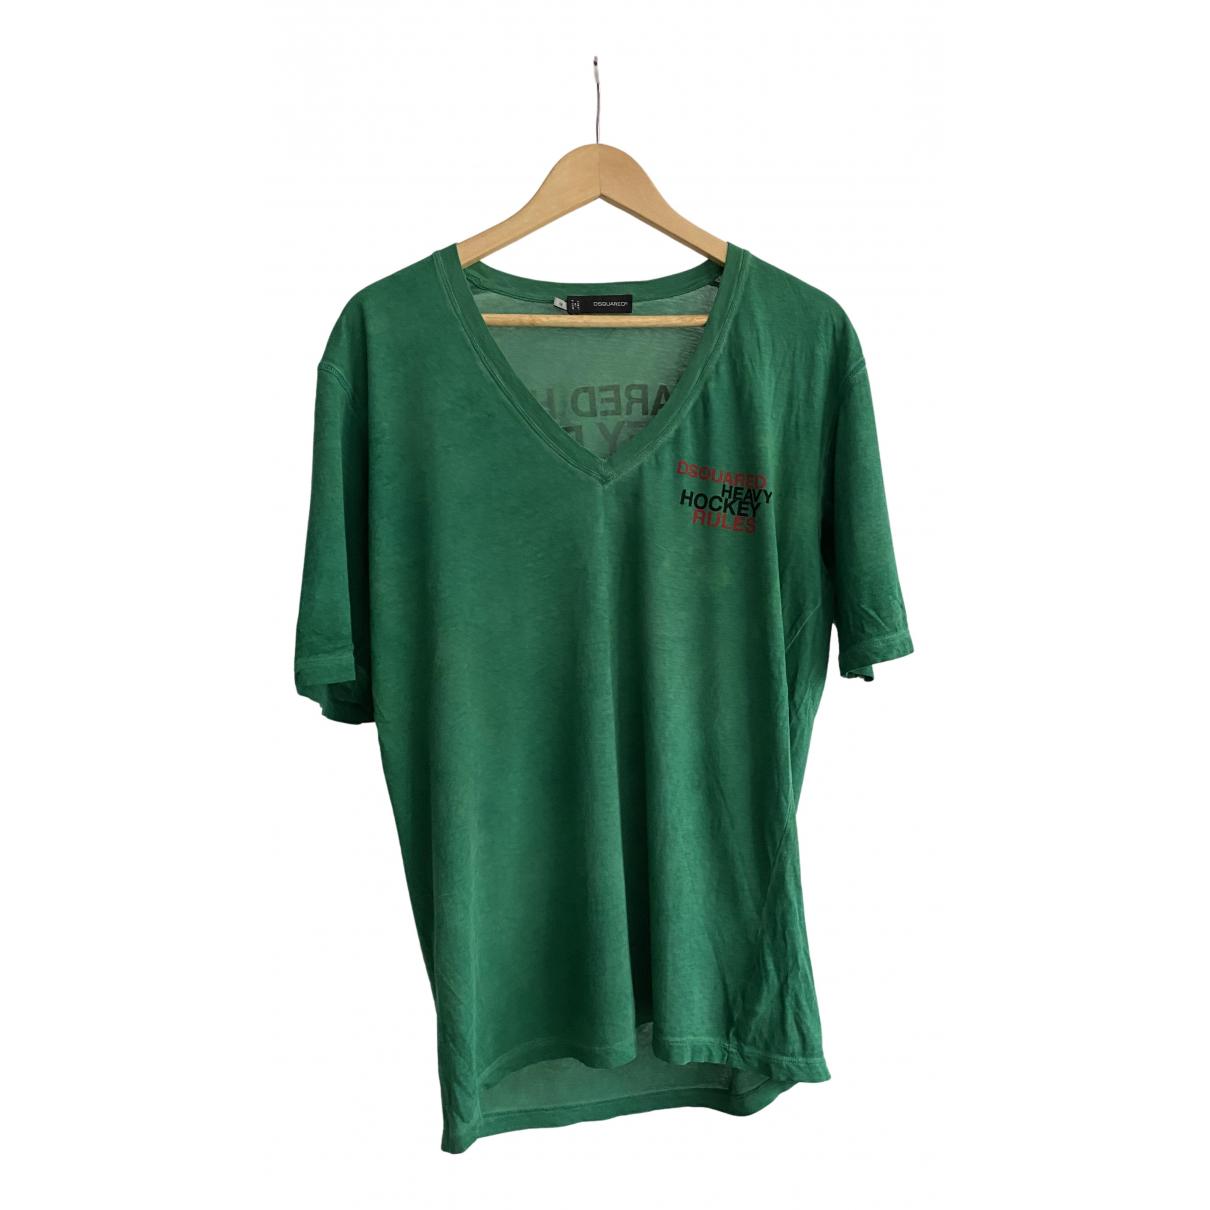 Dsquared2 \N T-Shirts in  Gruen Baumwolle